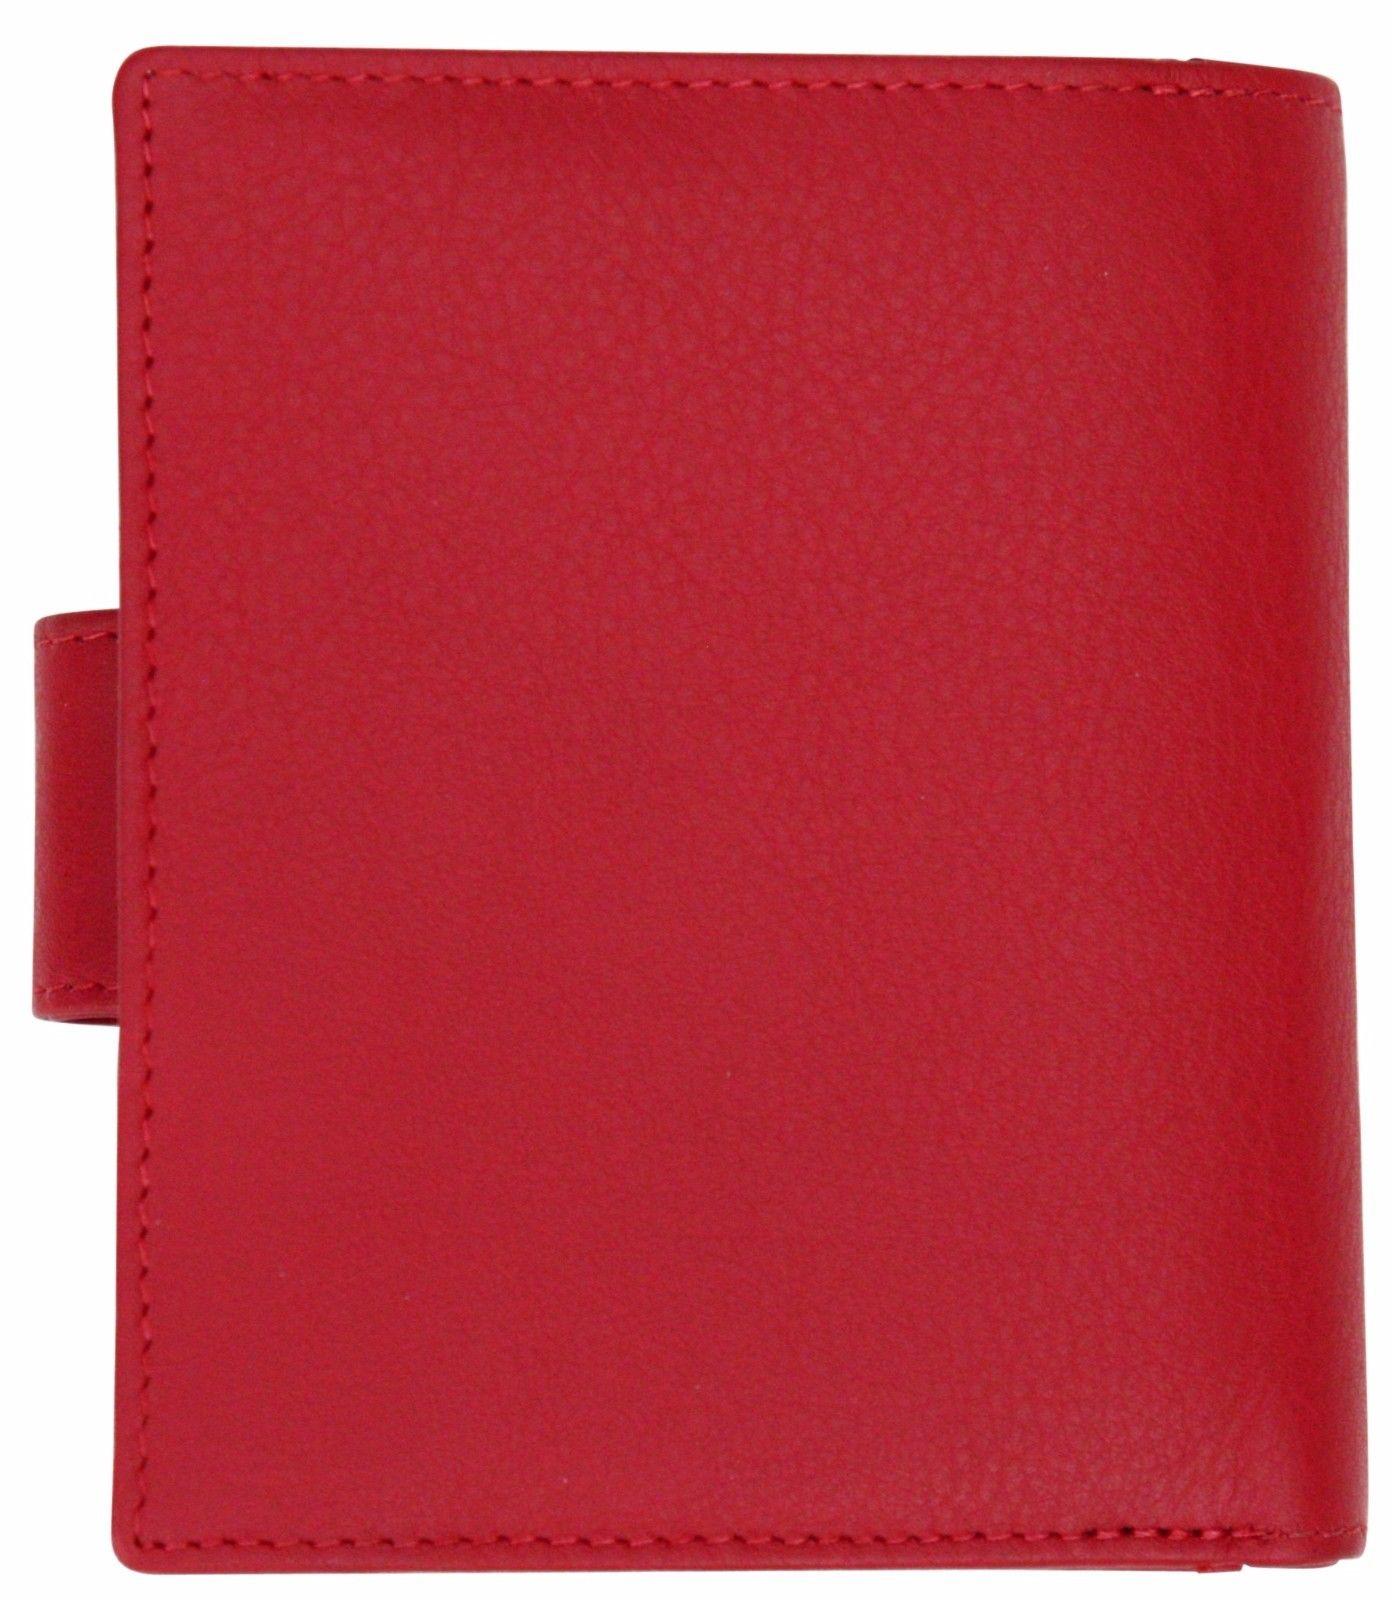 Felda-RFID-onorevoli-MEDAGLIA-amp-Card-Purse-Wallet-Genuine-Leather-Multi-SOFT-BOX-REGALO miniatura 100